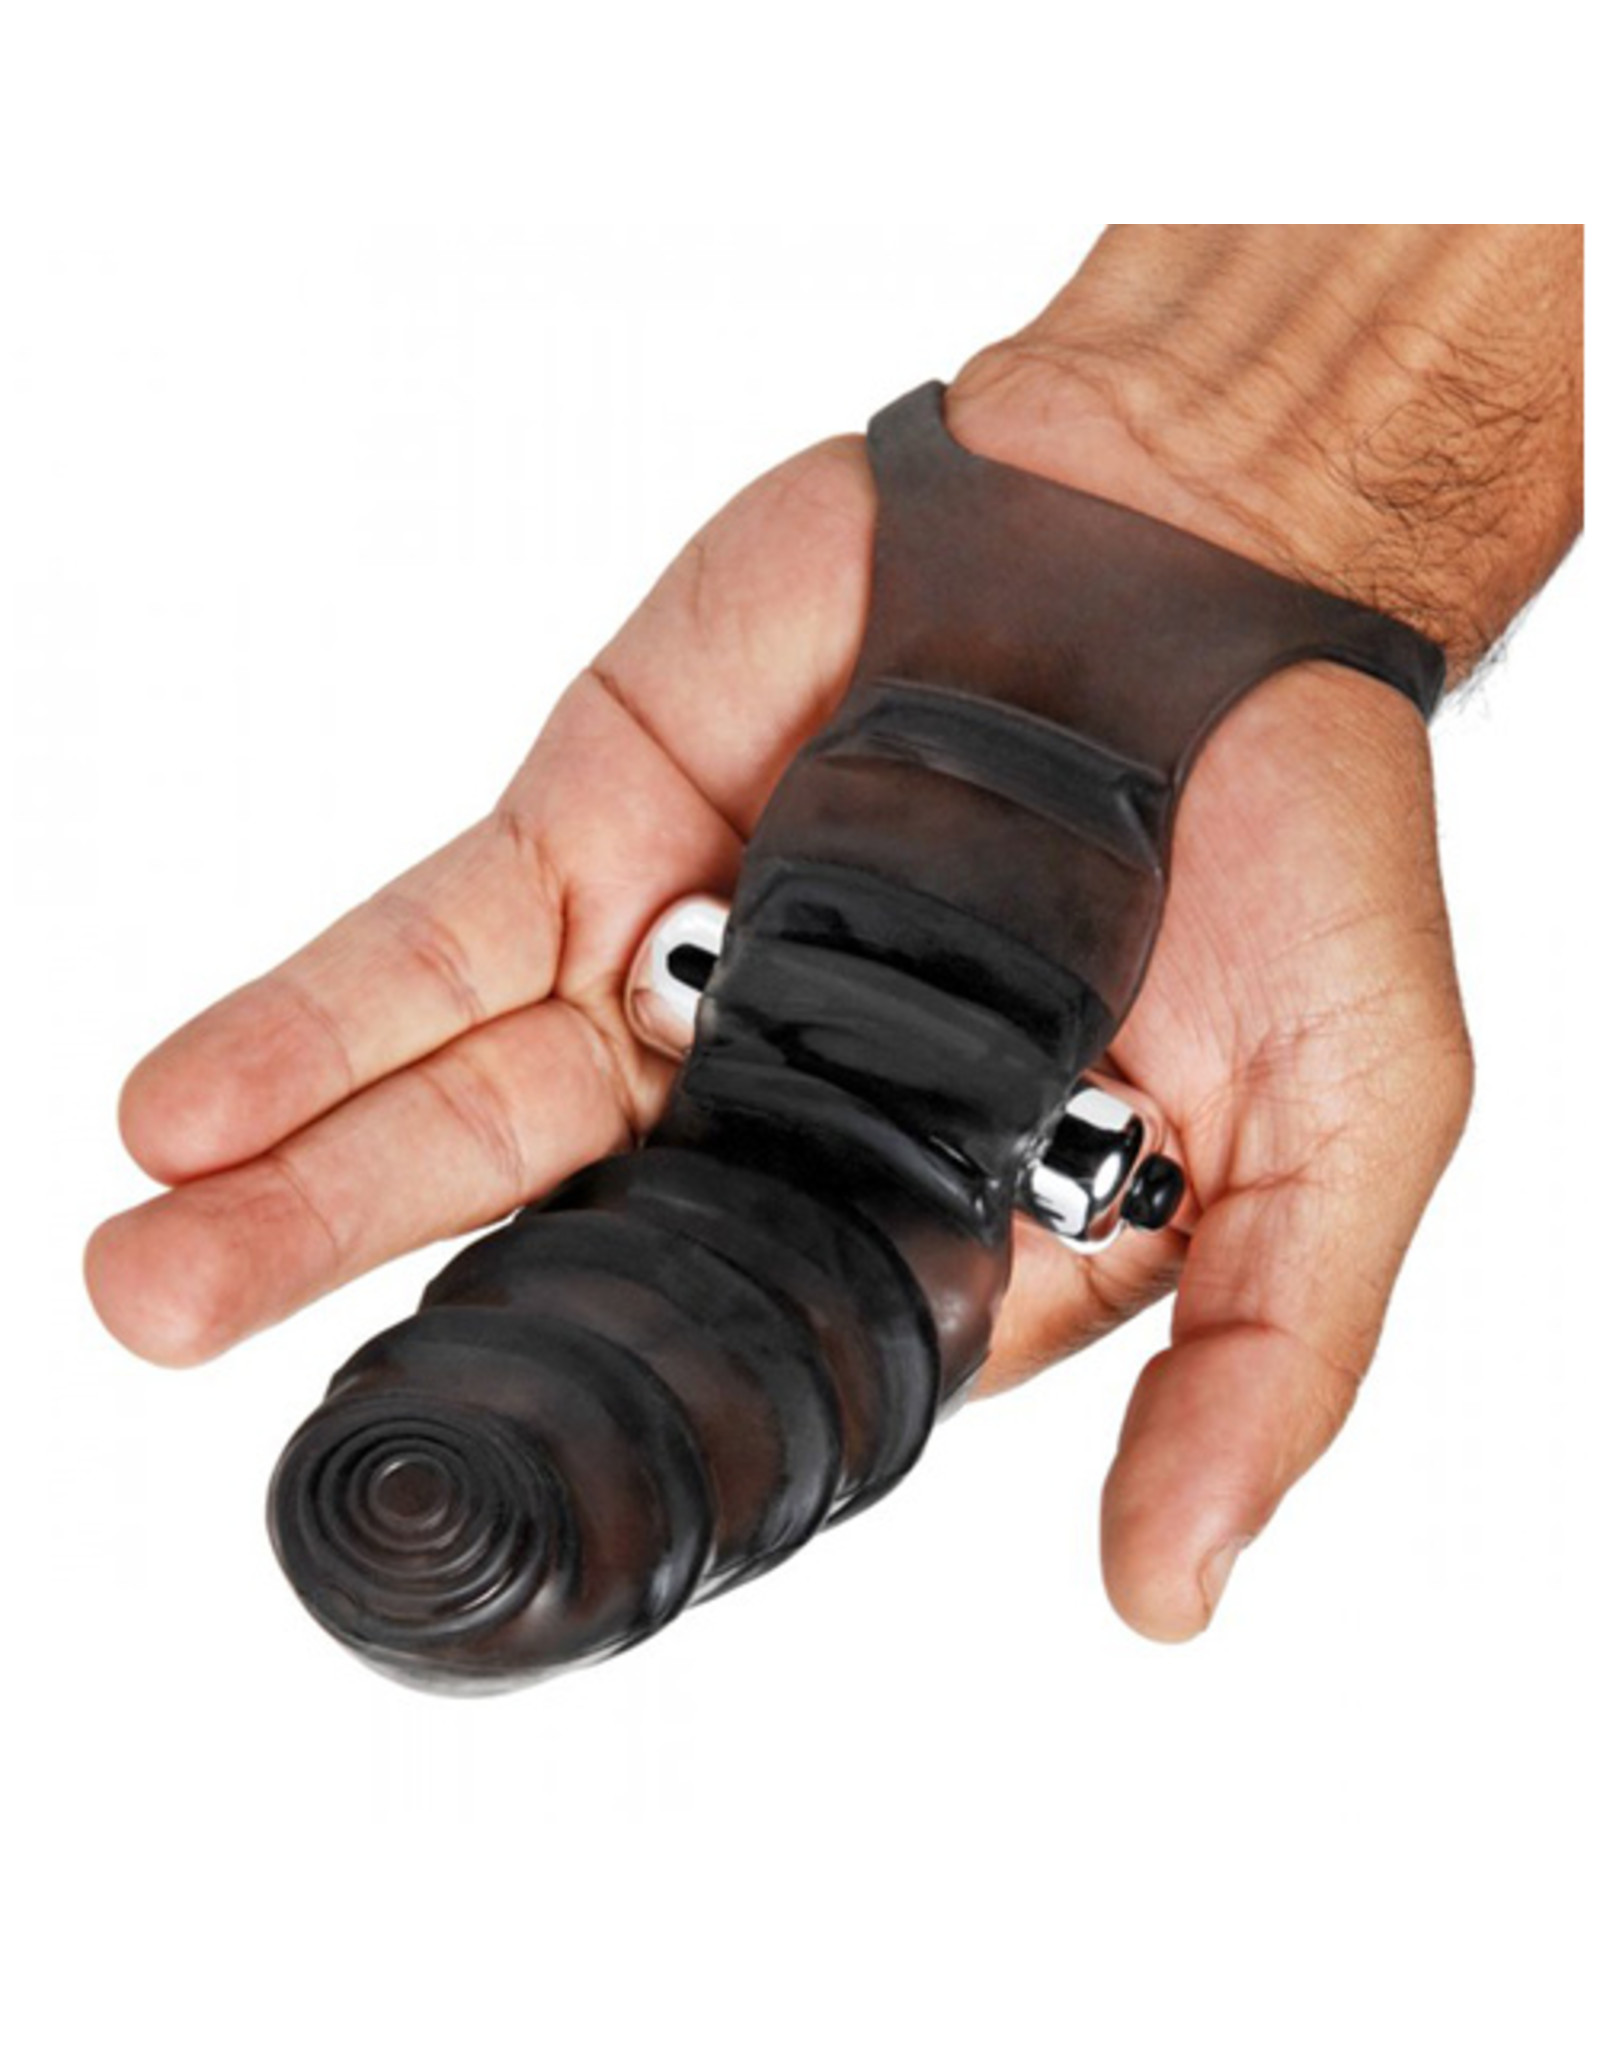 Master Series Bang Bang G-spot Vibrerende Vingerstimulator